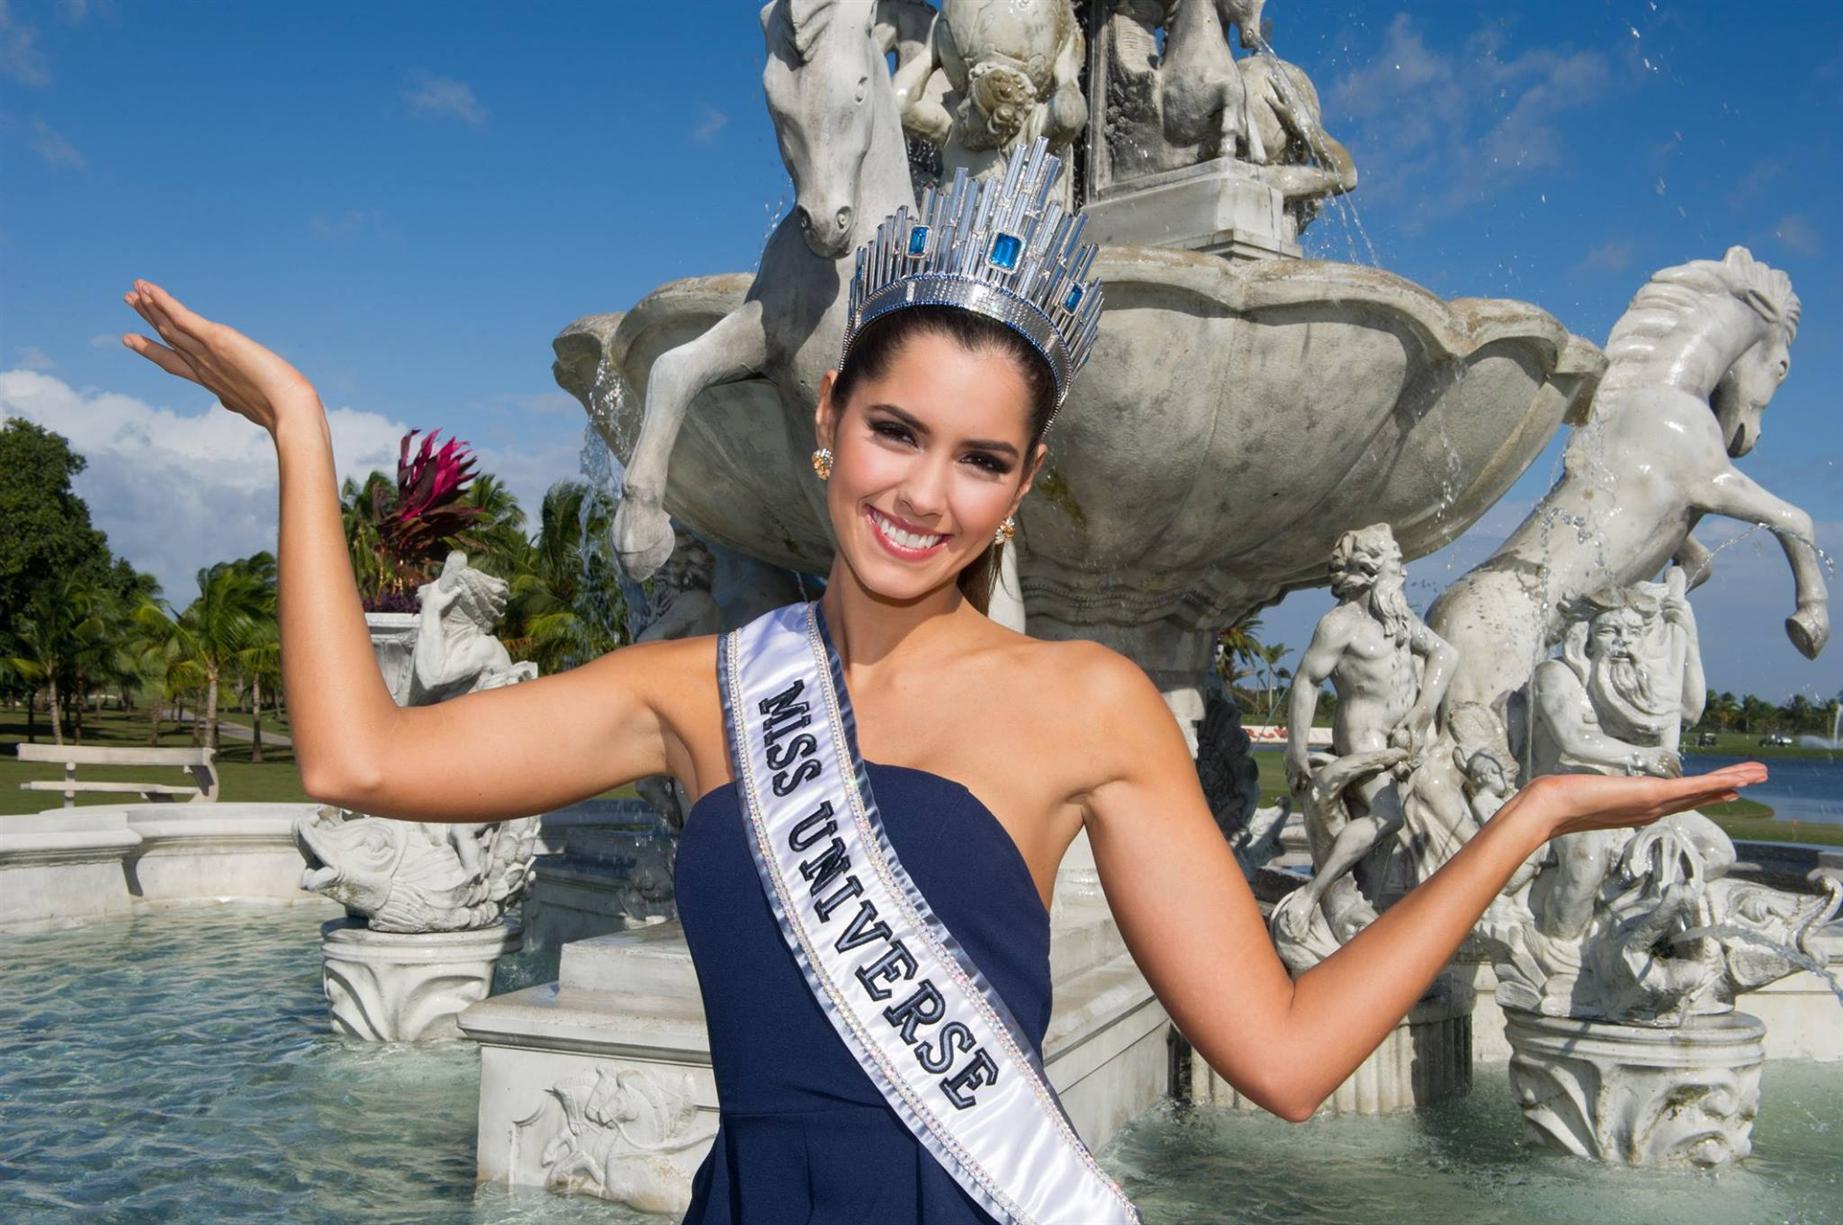 Miss Universe Paulina Vega: Miss Universe 2014 Photos